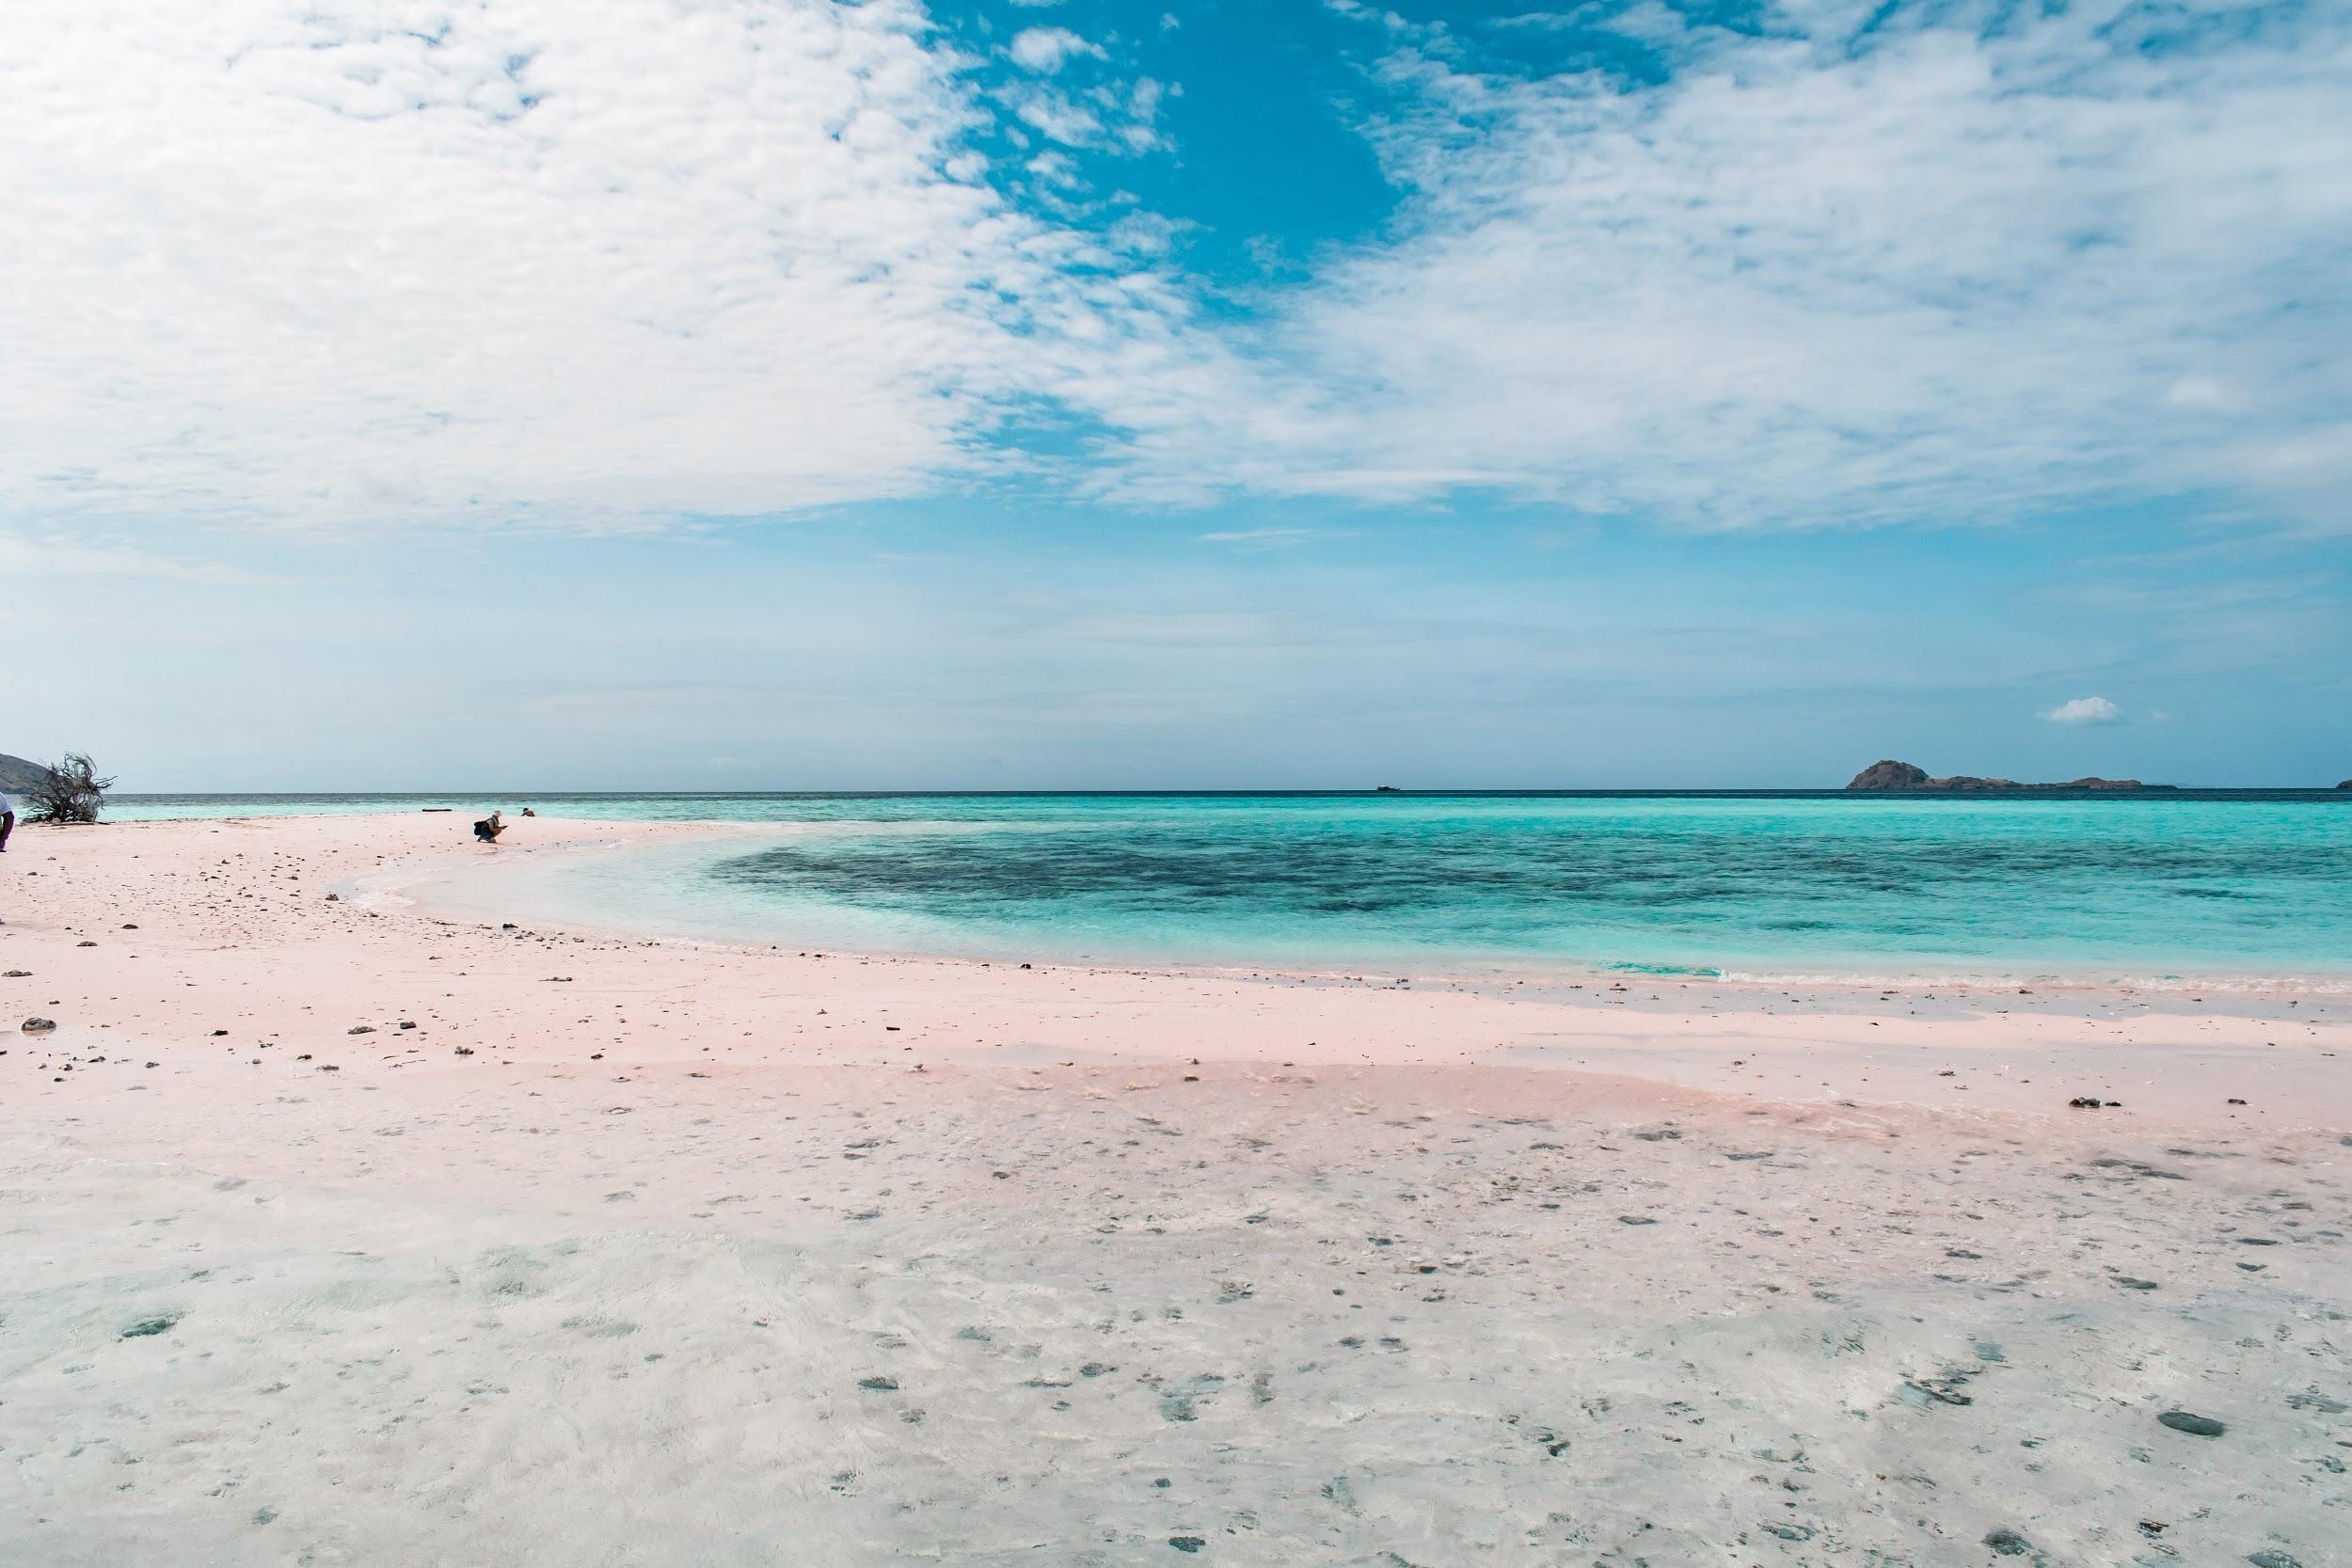 backpacking Malaysia - Perhentian Islands - beach - turquoise sea